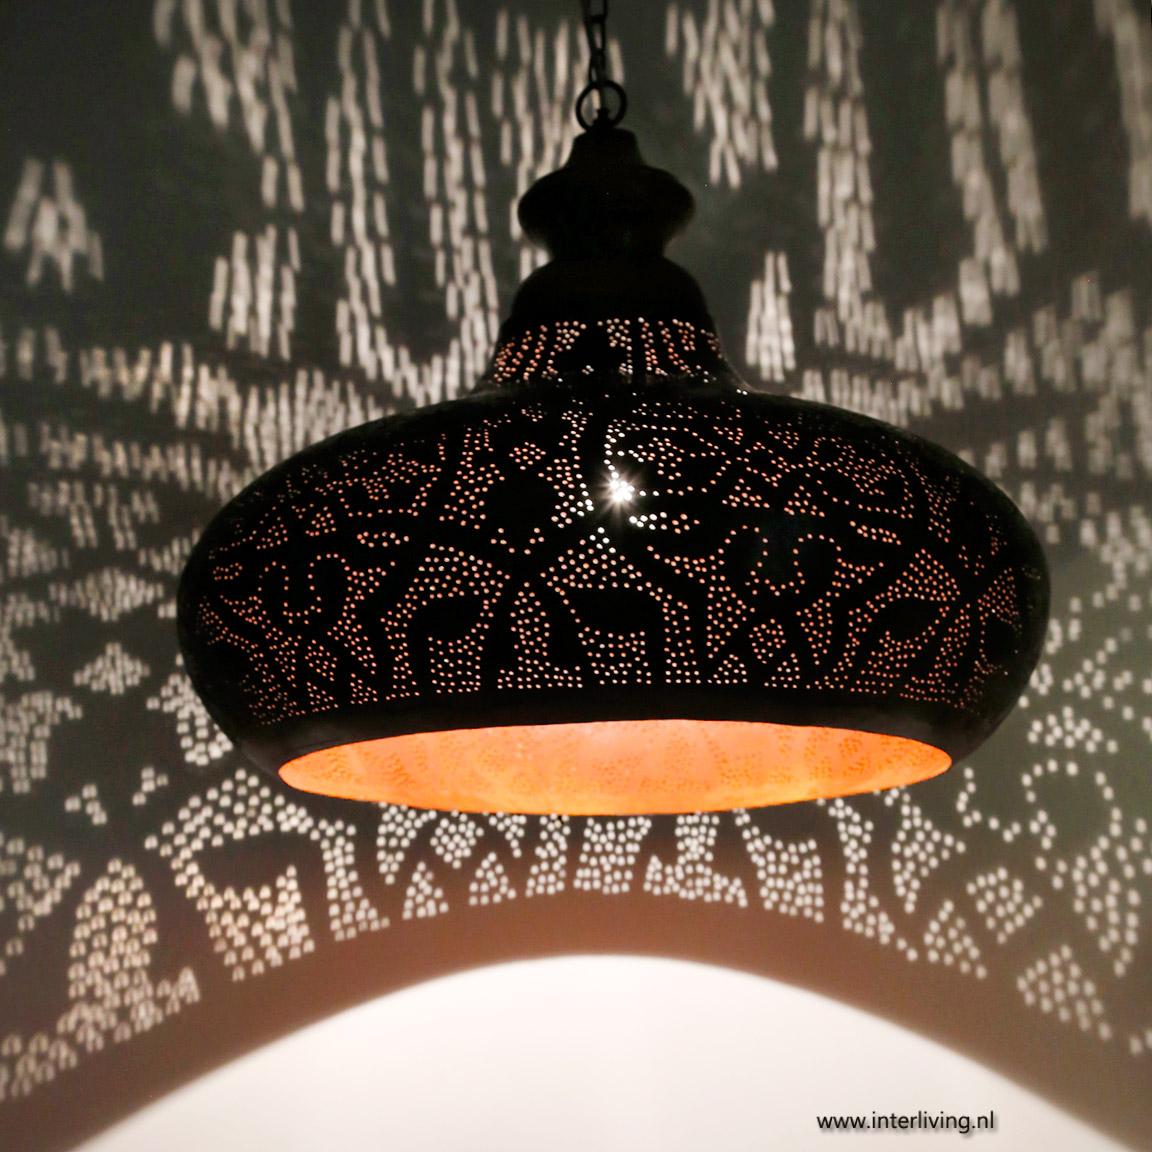 Industriële hanglamp met oosterse twist en hout - roest,zwart,goud